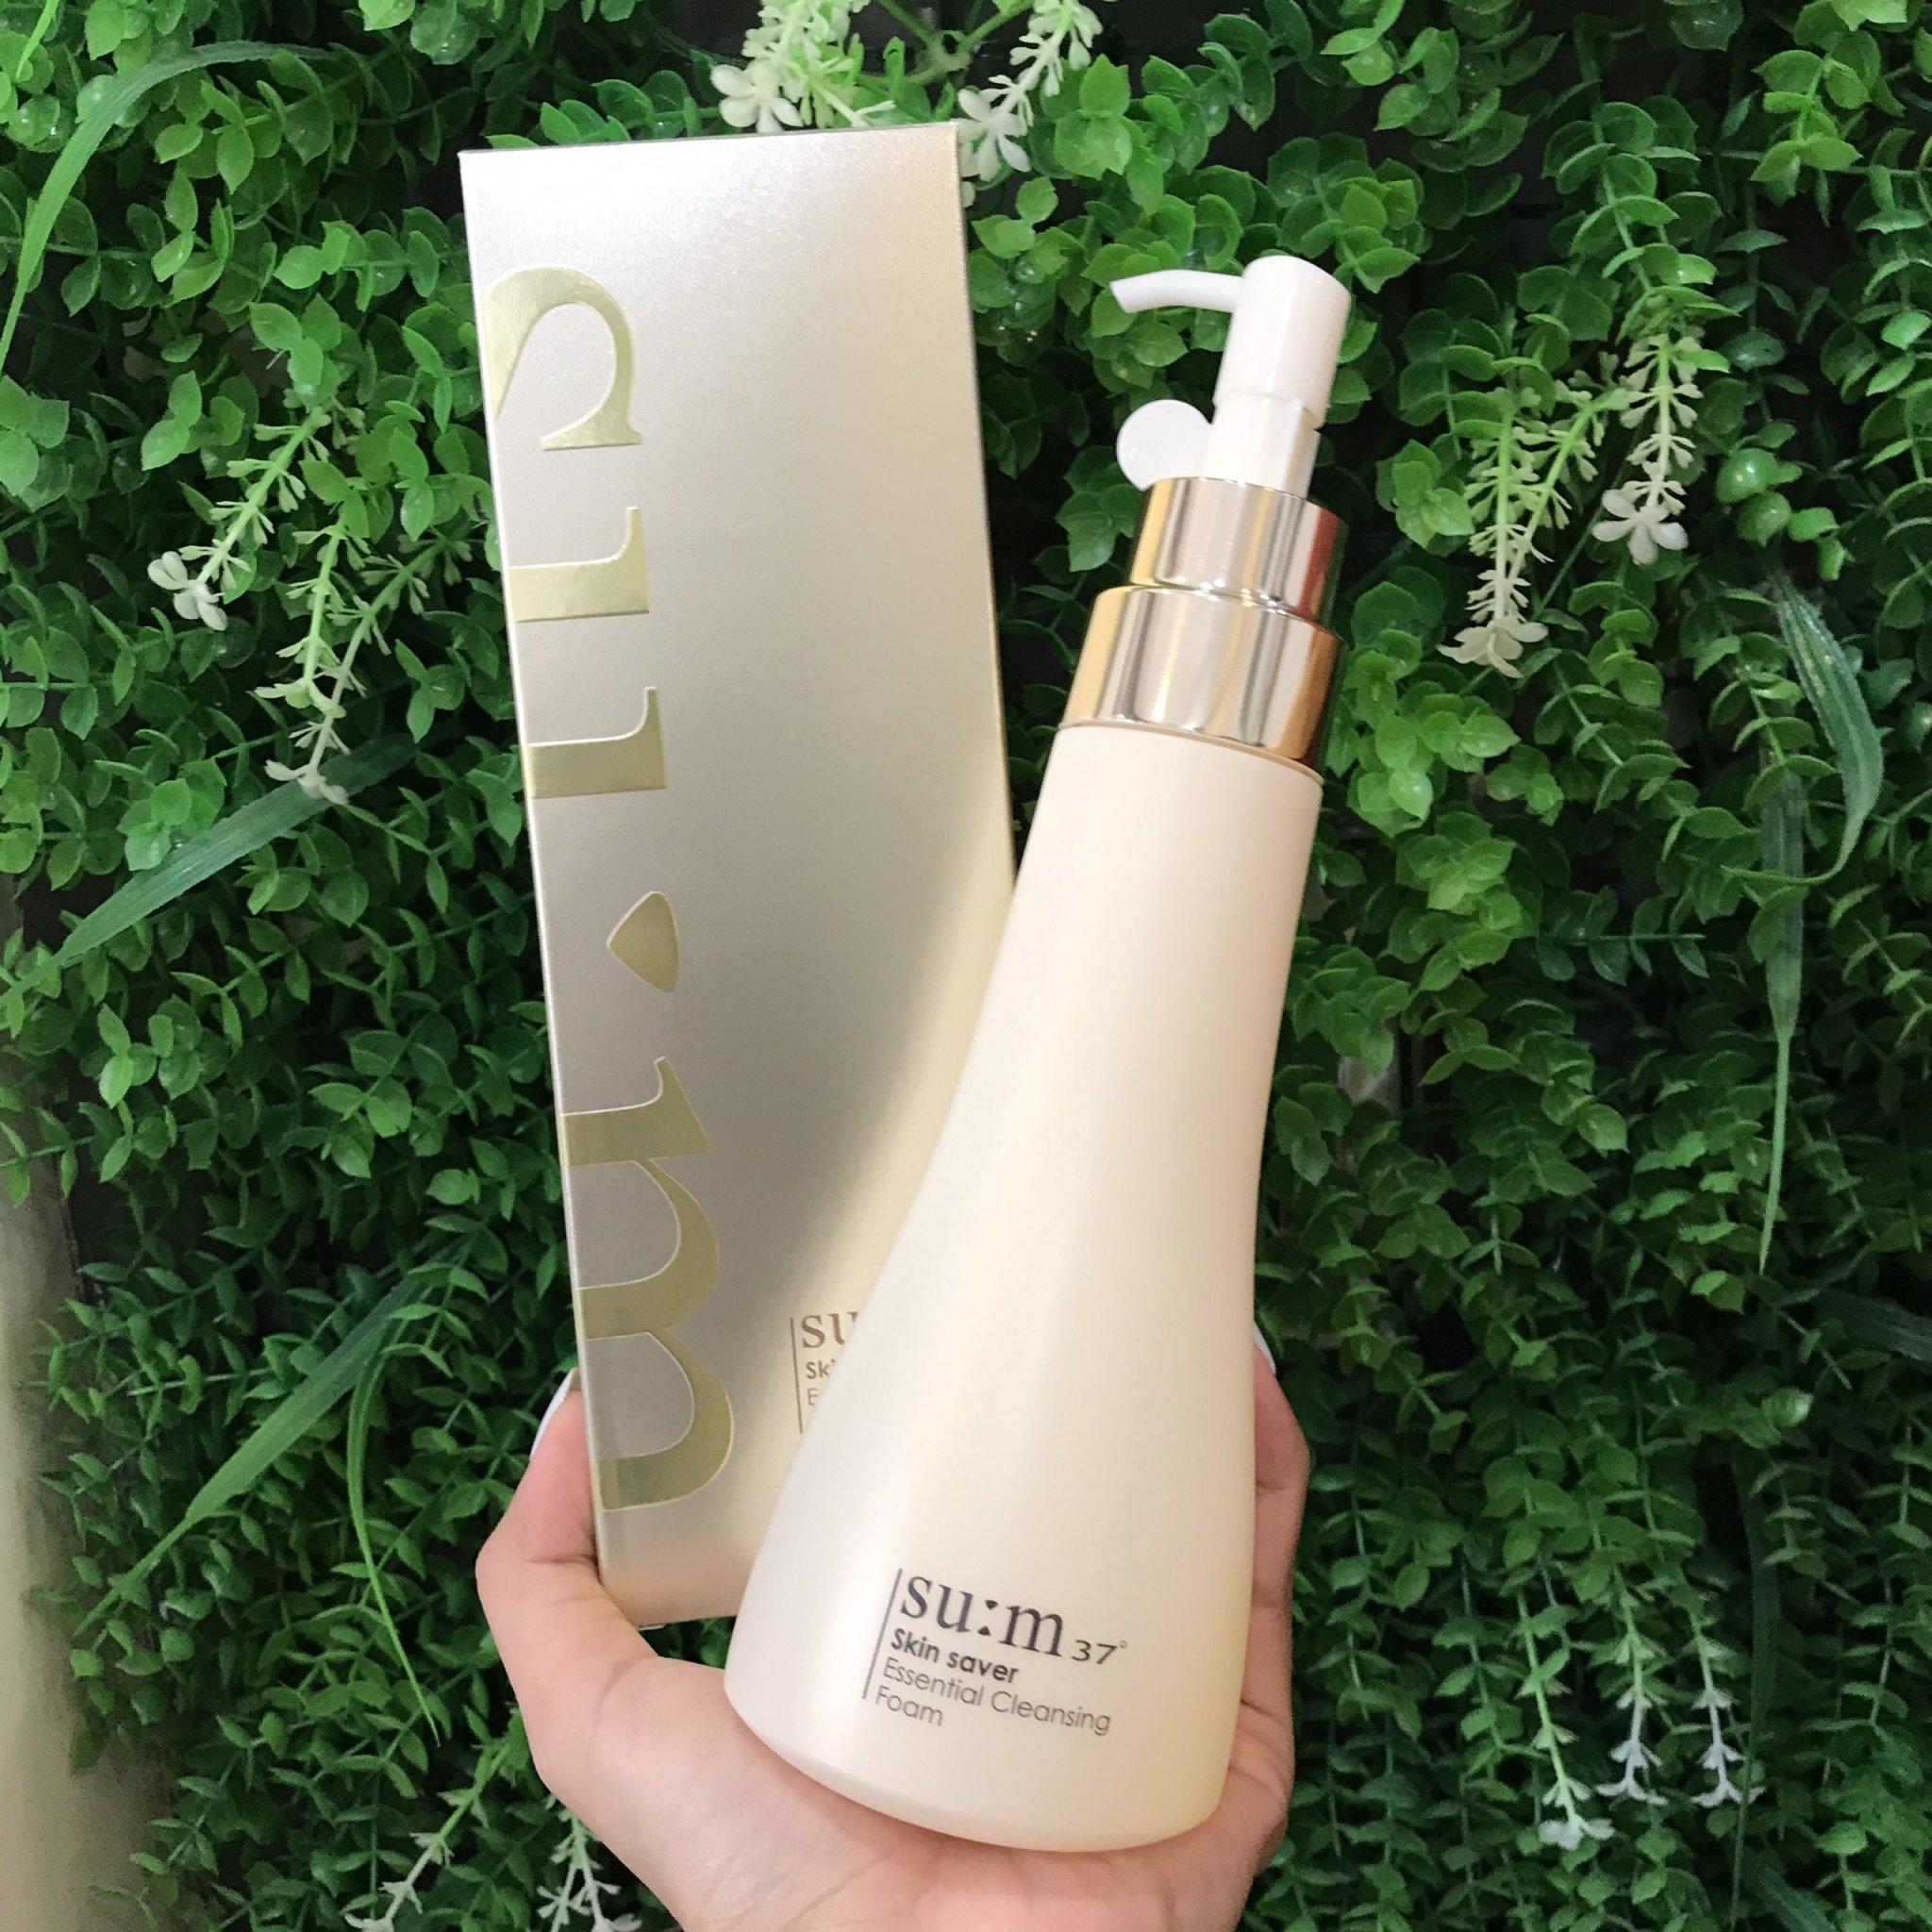 Sữa rửa mặt dạng gel Su:m37 Skin Saver Cleansing Foam 250ml